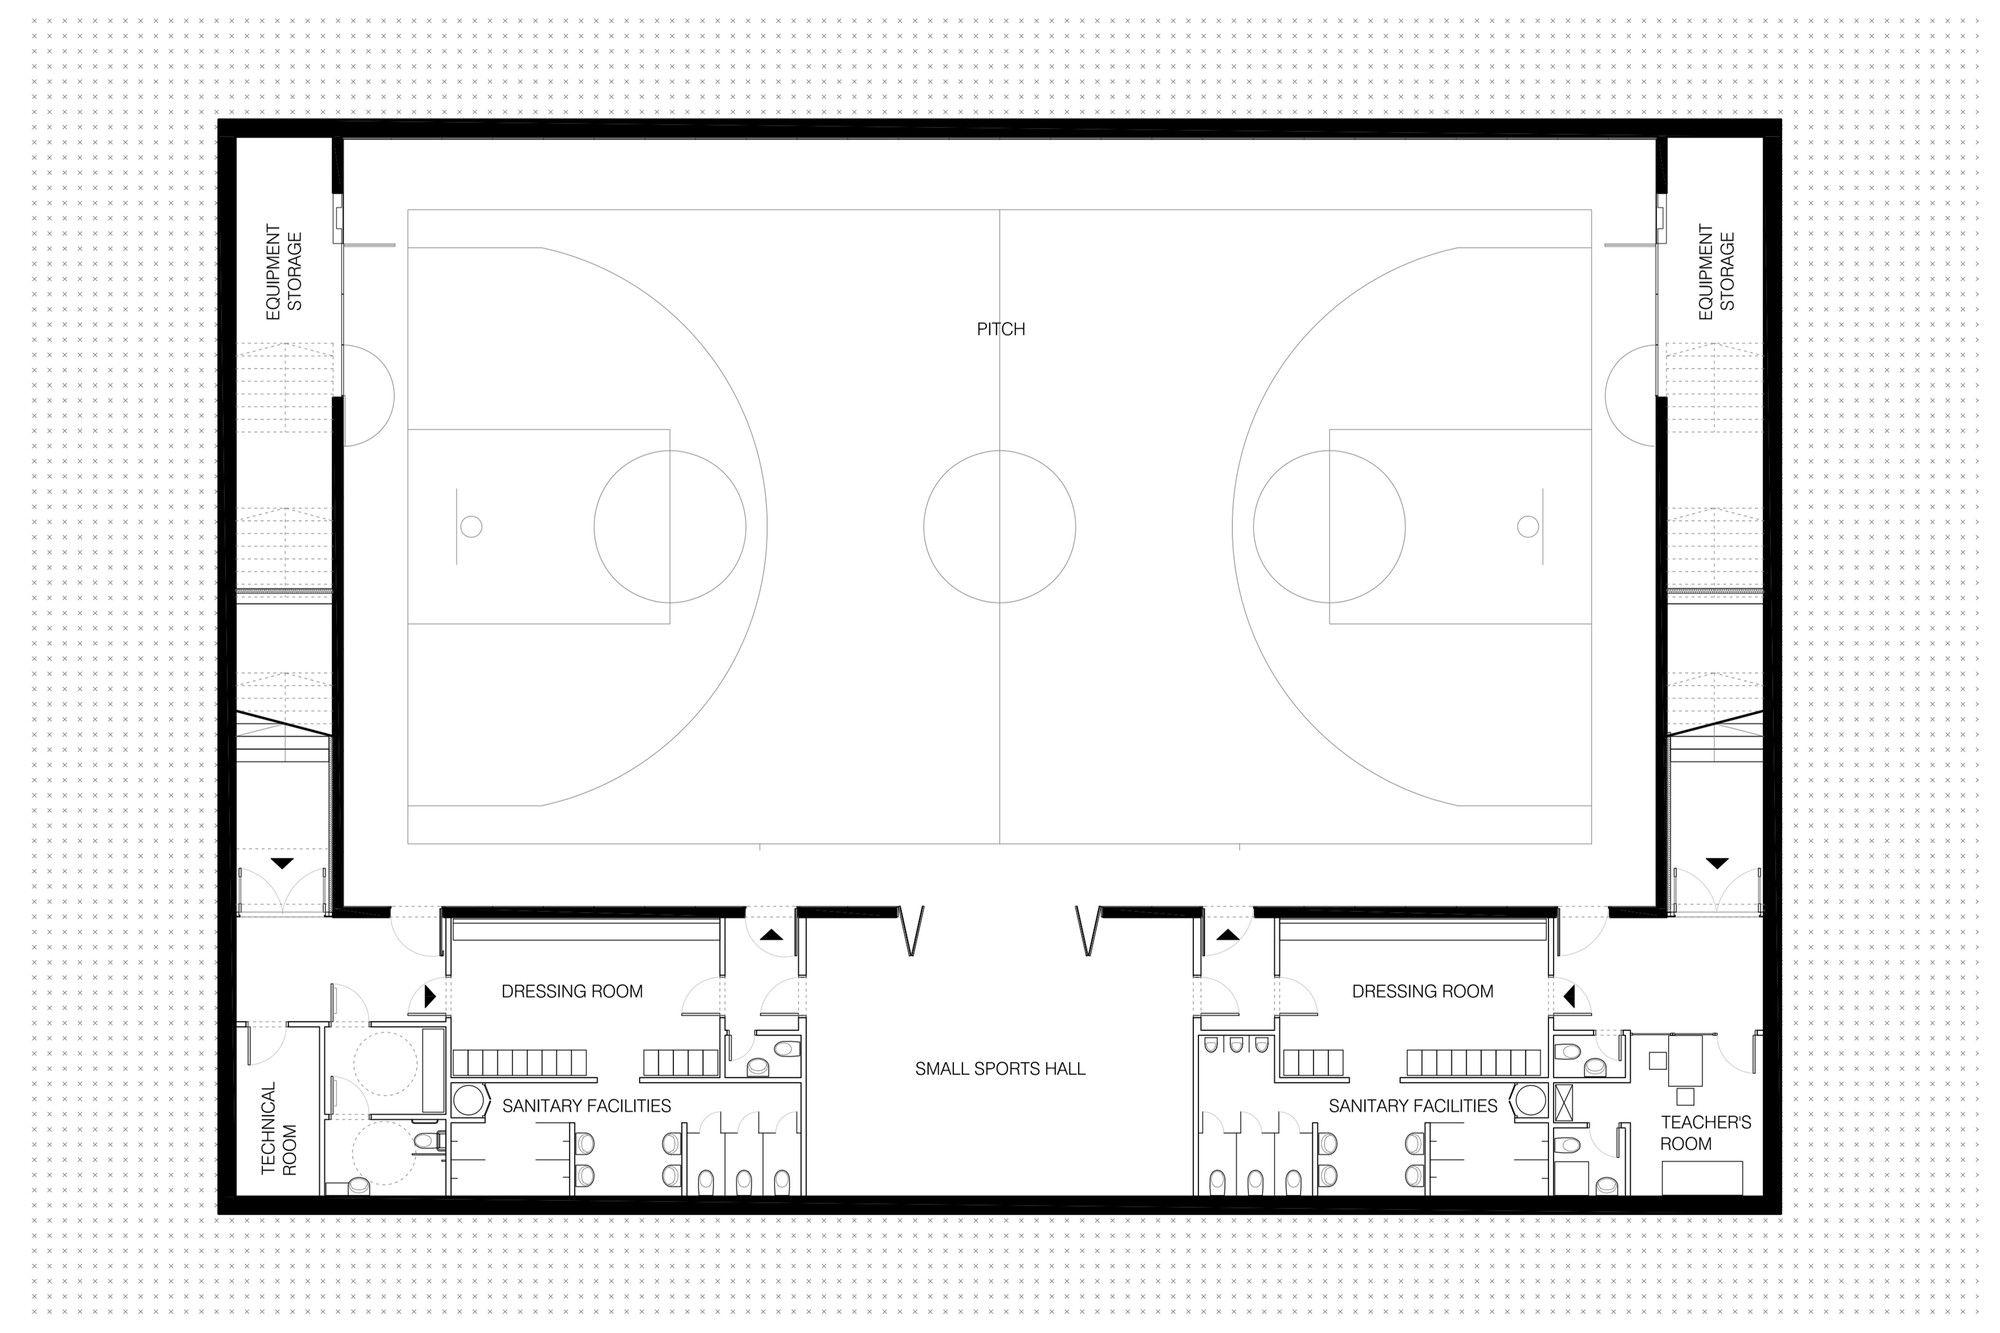 Gallery of Matchbox Elementary School Sports Hall / Jovan